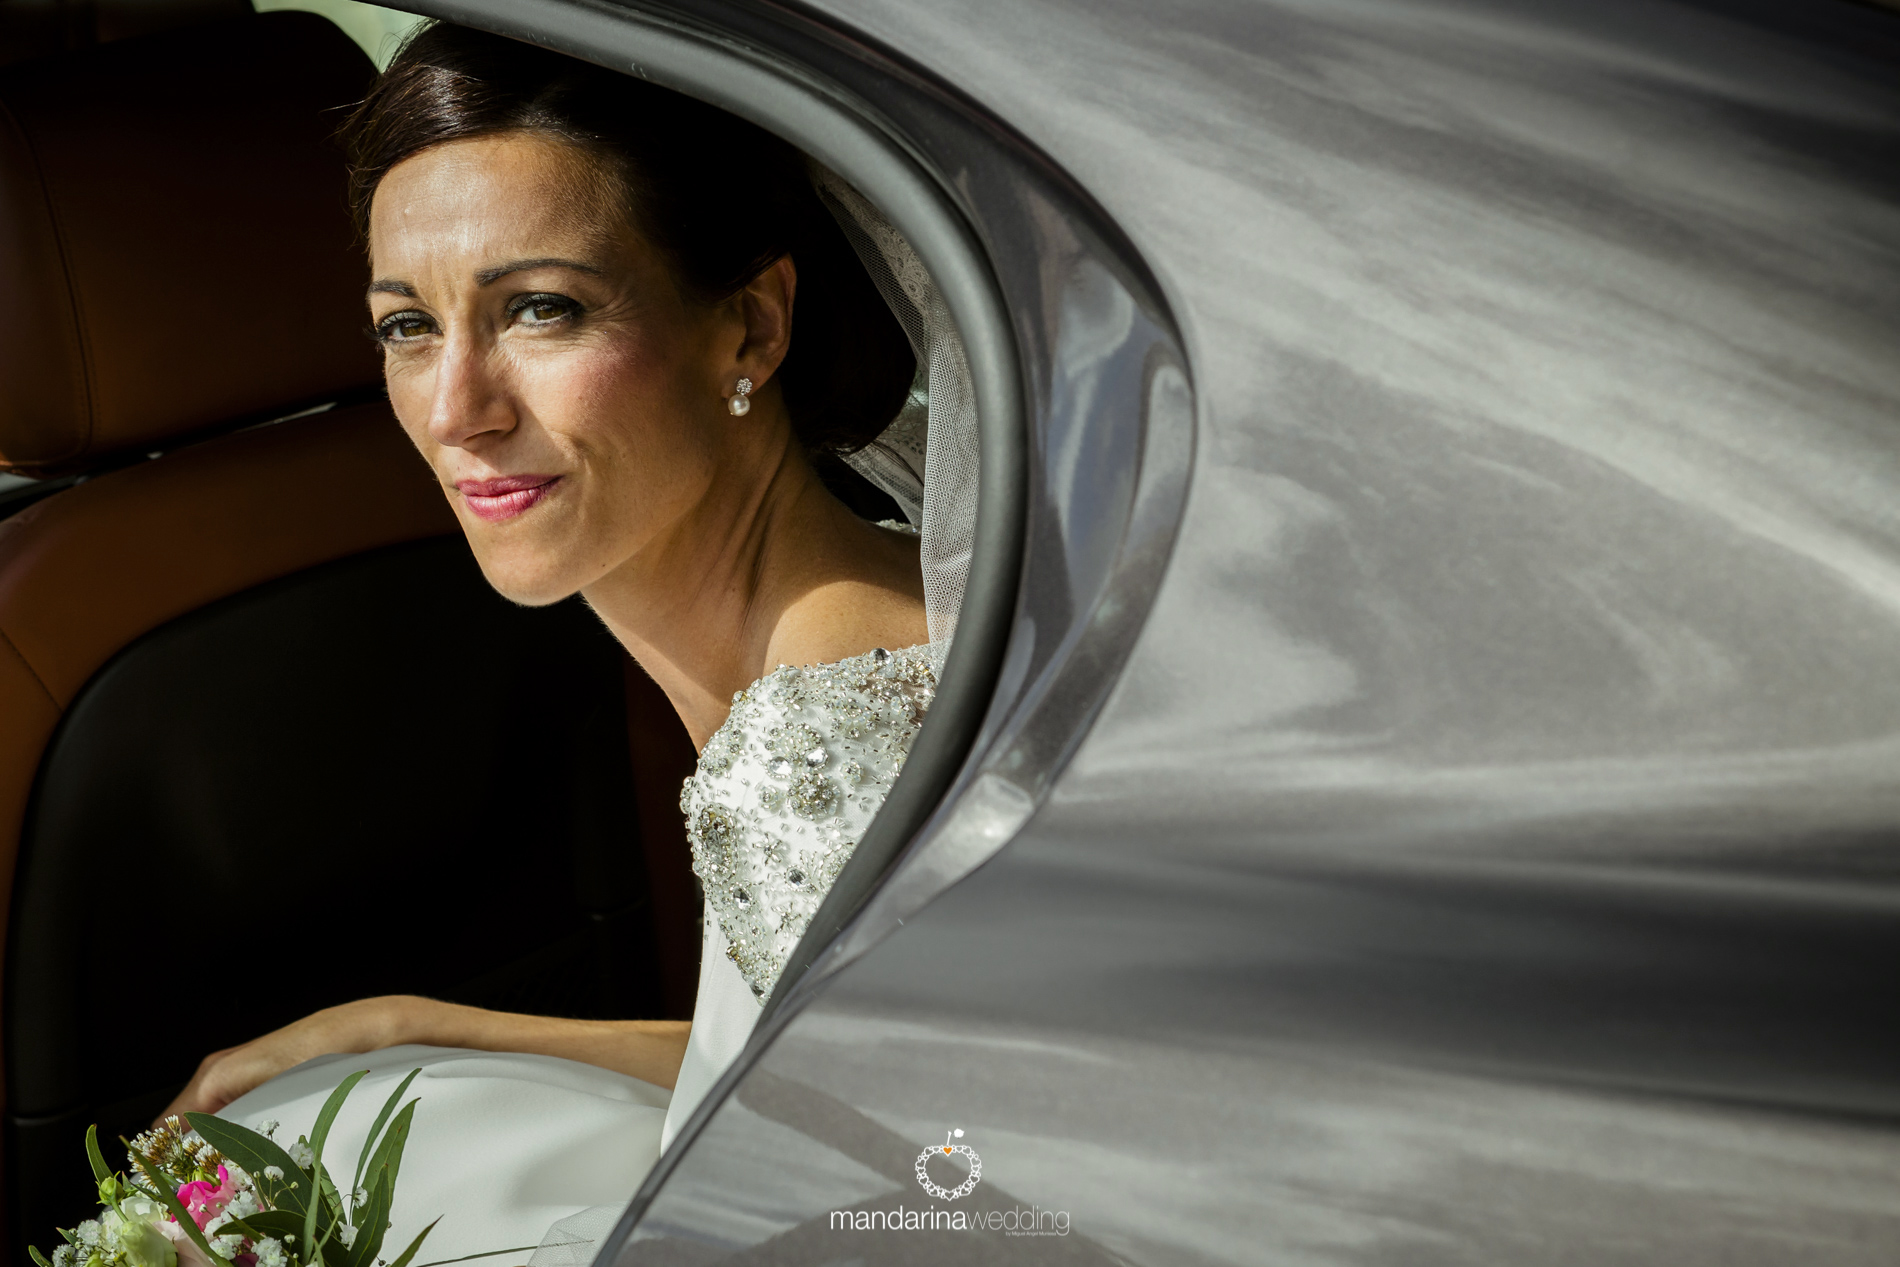 mandaria wedding, fotografos de boda, fotoperiodismo de boda, mejores fotografos de boda, bodas soria, bodas pirineo, bodas Madrid, fotógrafos tarragona_05